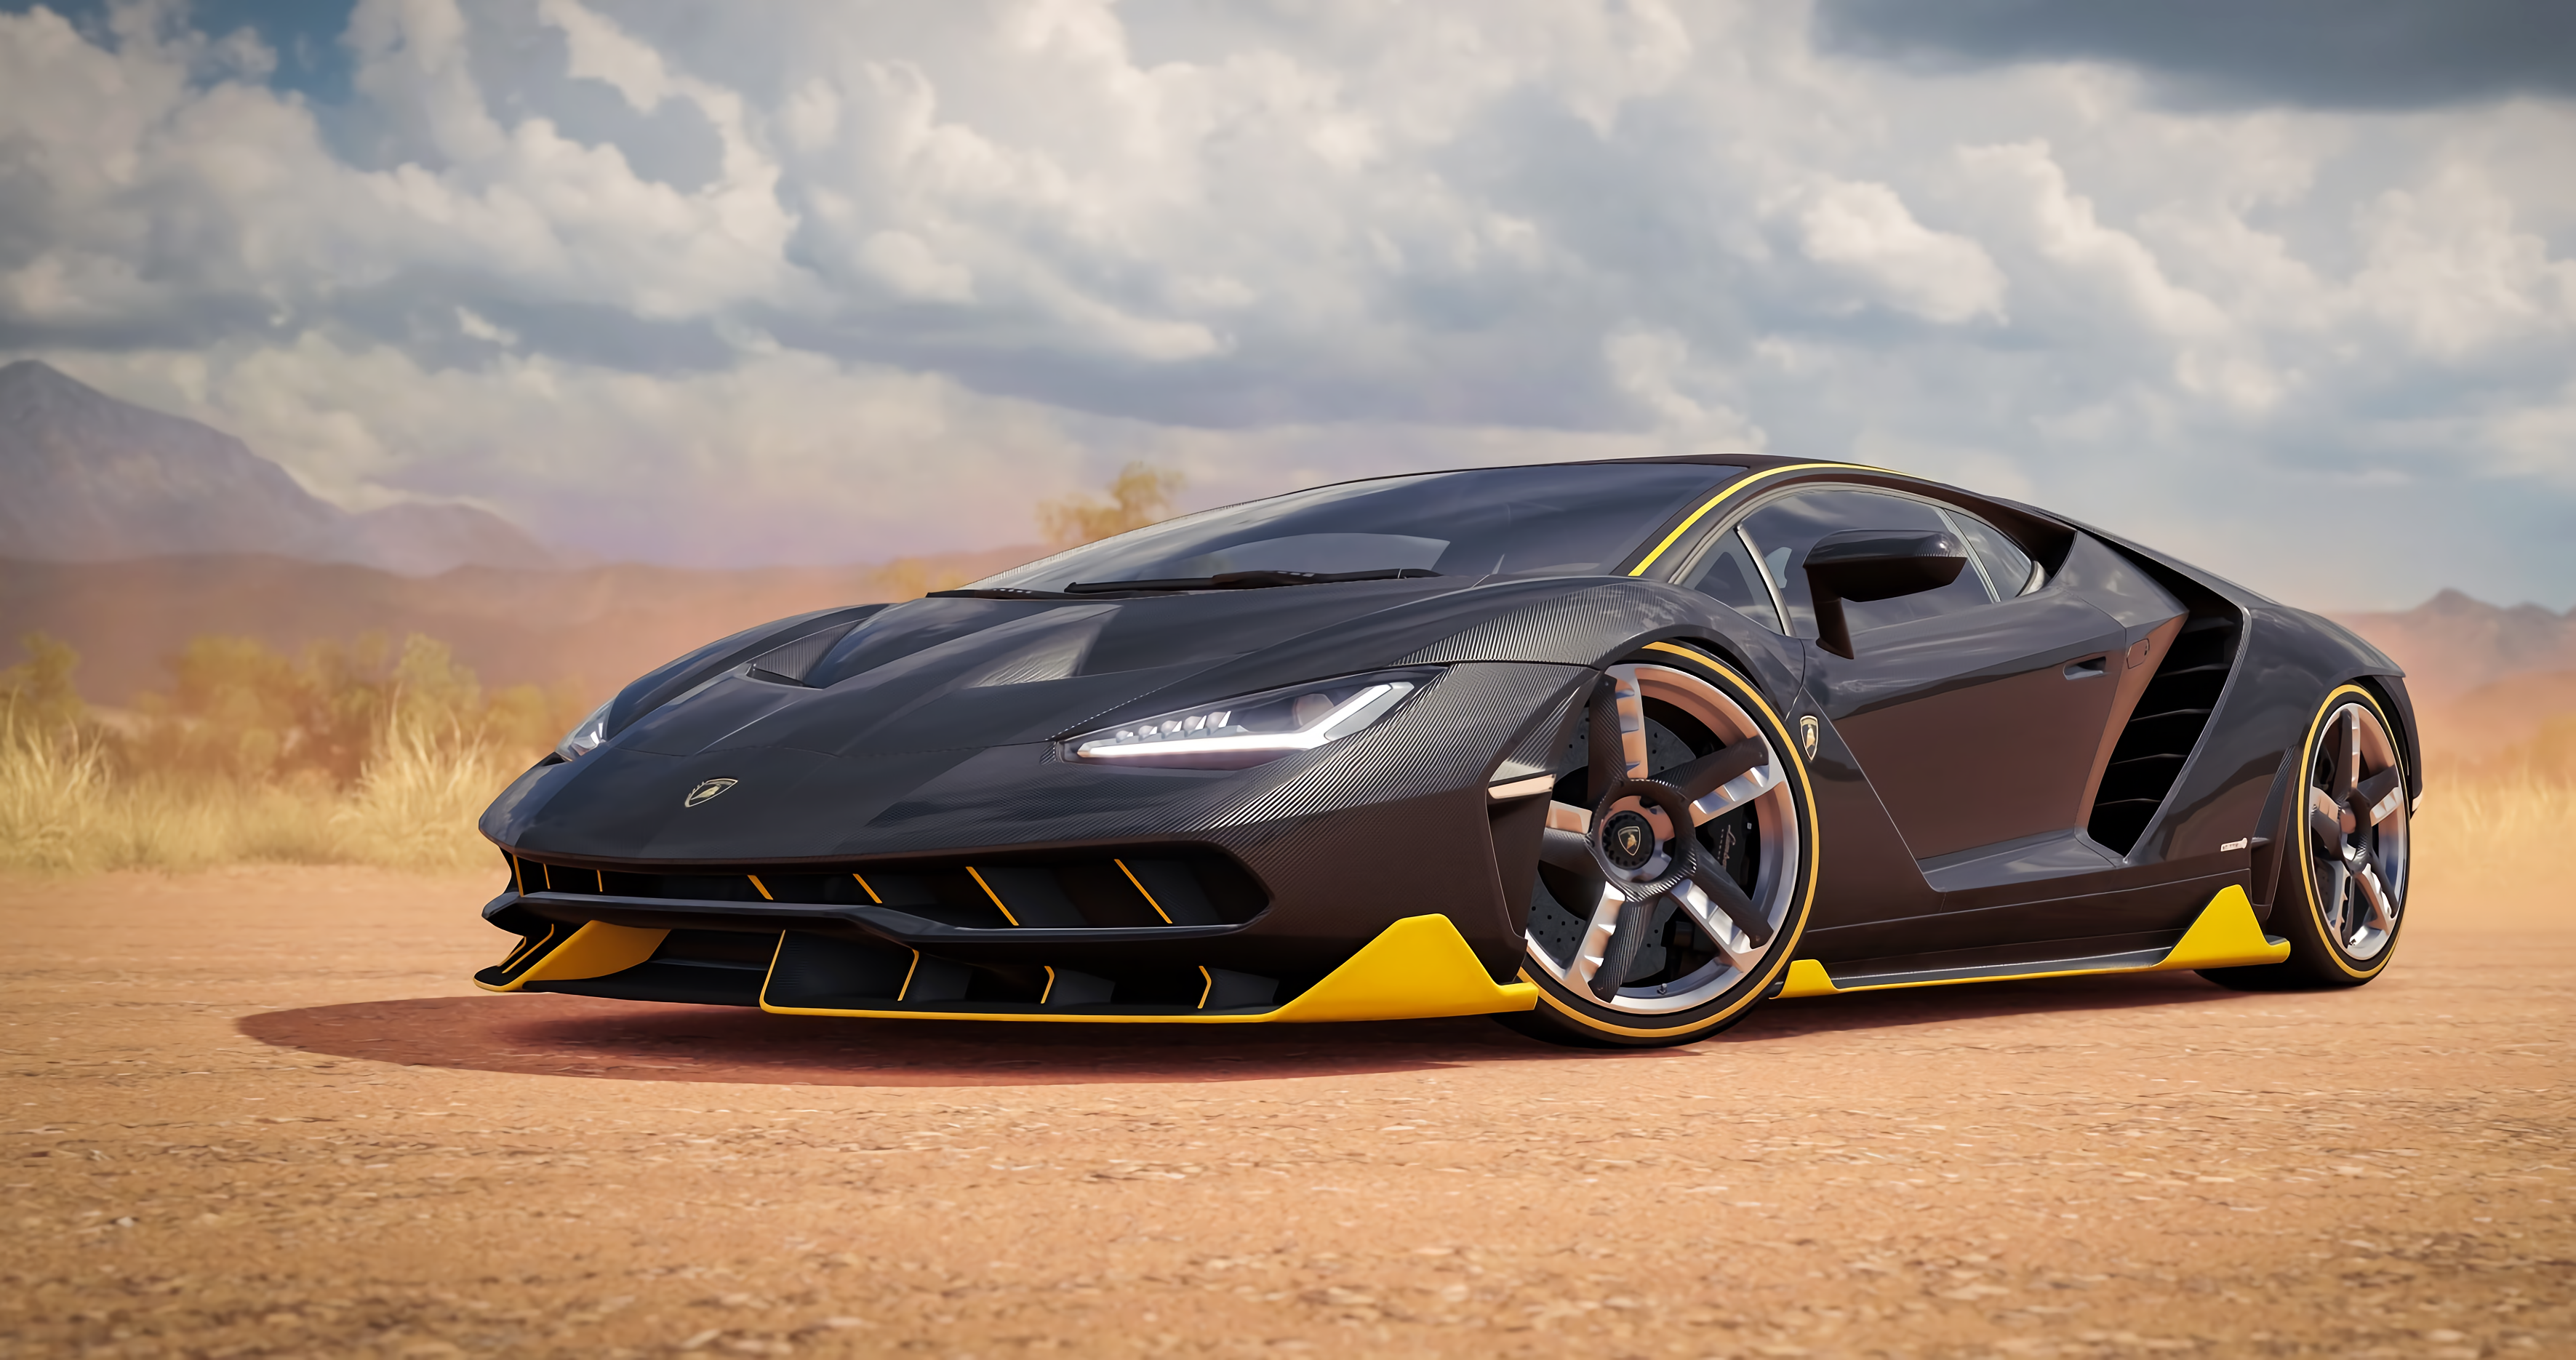 3840x2160 Lamborghini Centenario Limited Edition Psw